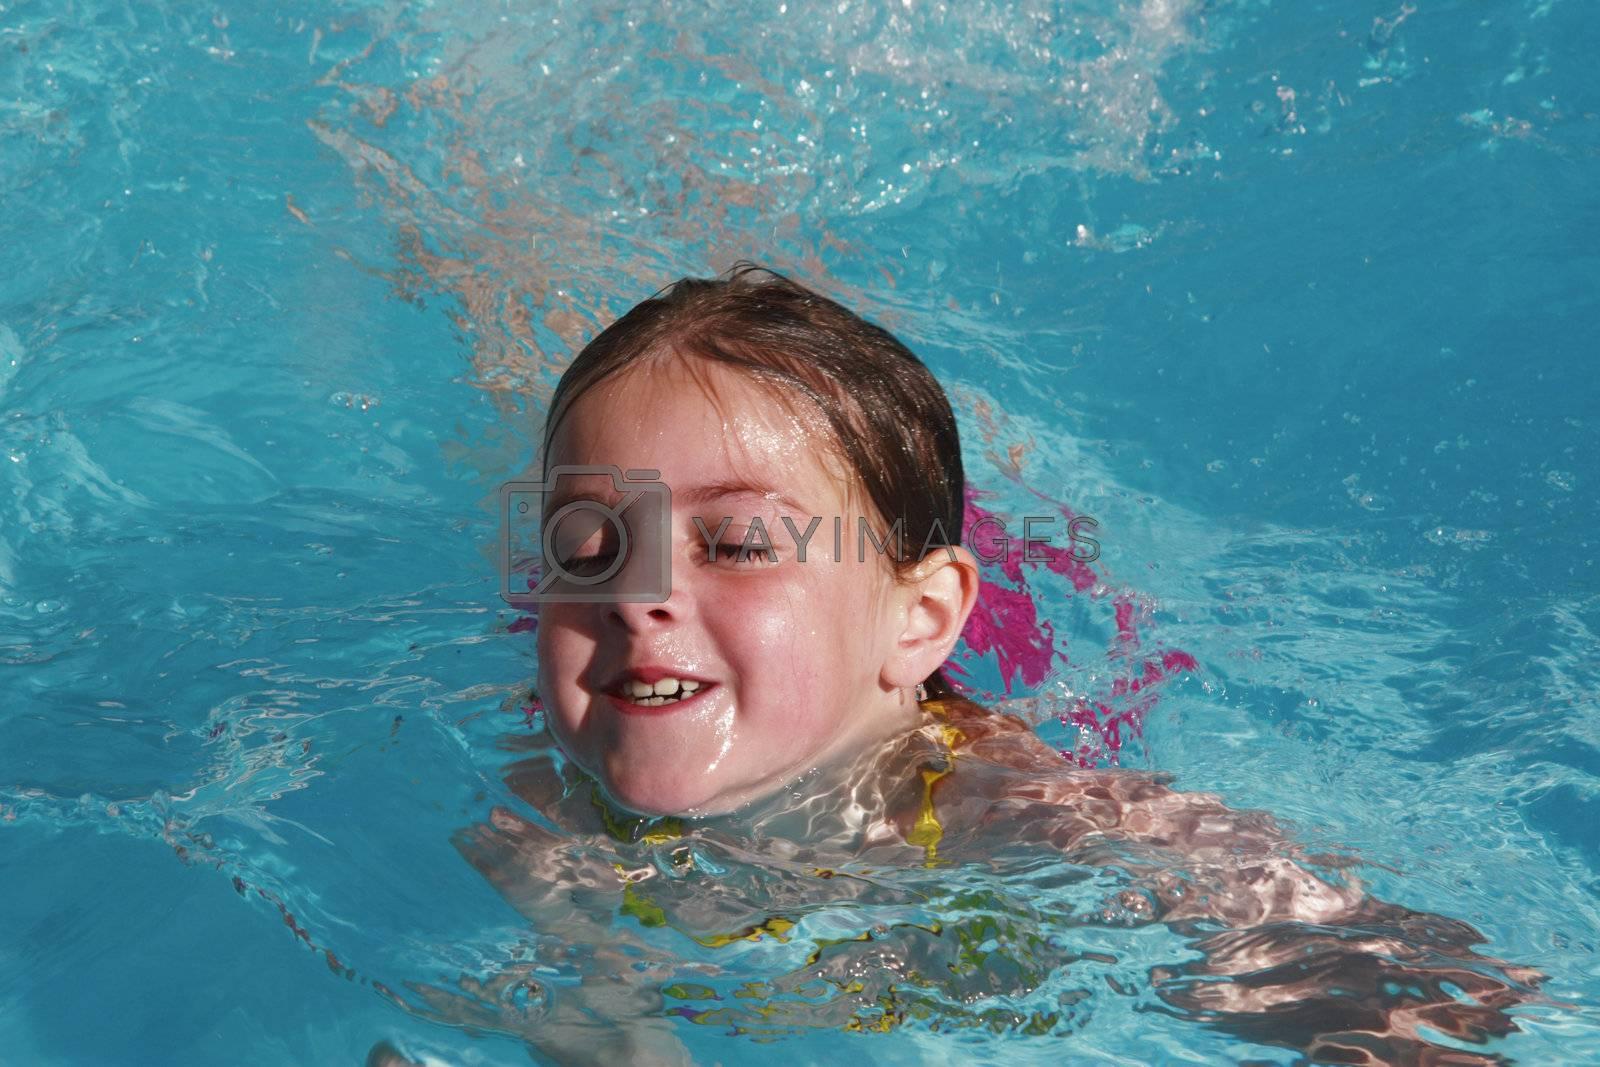 girl having fun just floating in a pool